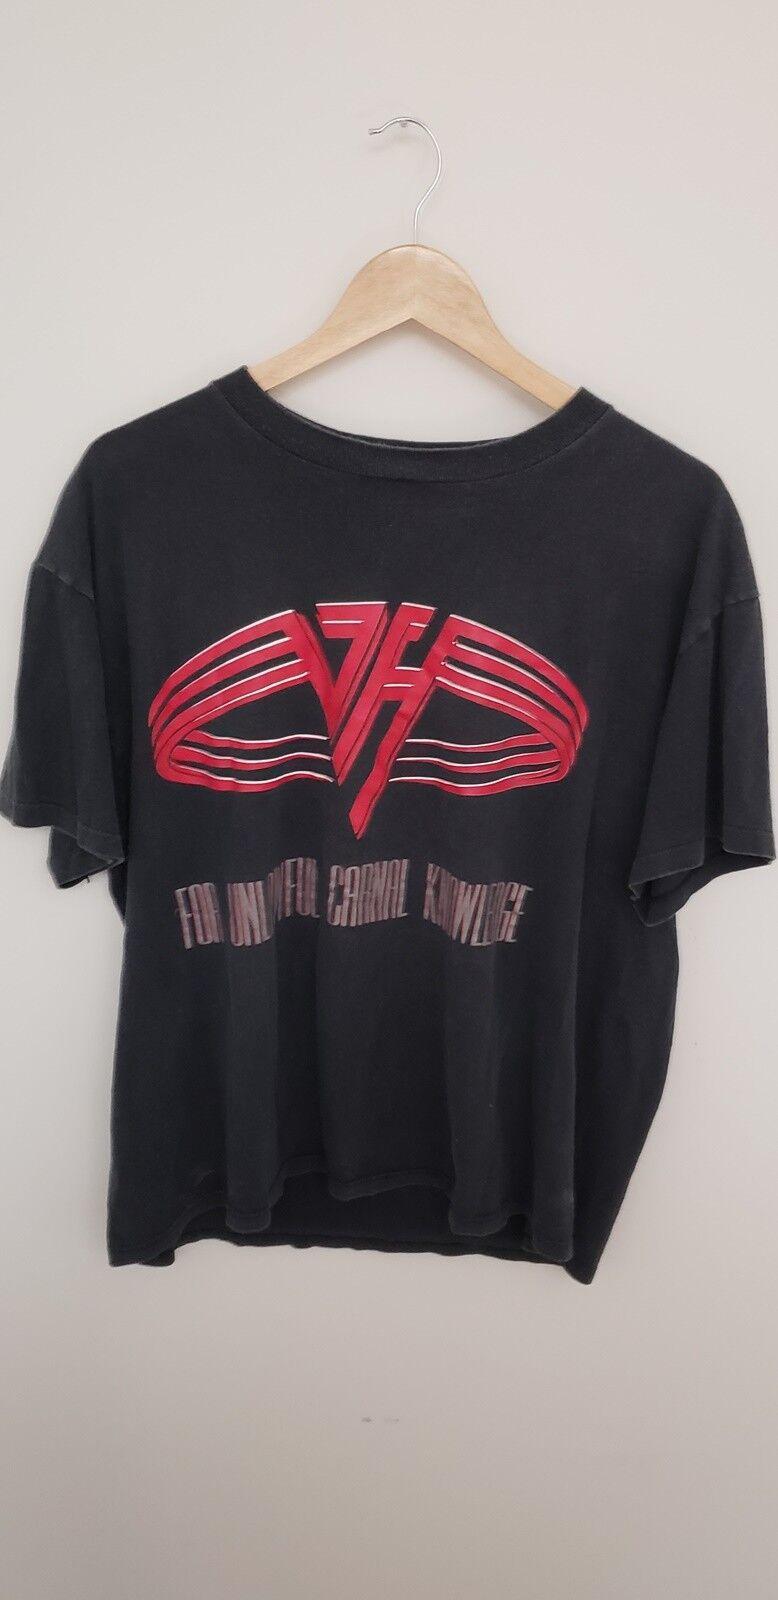 Vintage 90's Van Halen For Unlawful Carnal Knowledge Charlotte NC Shirt - XL